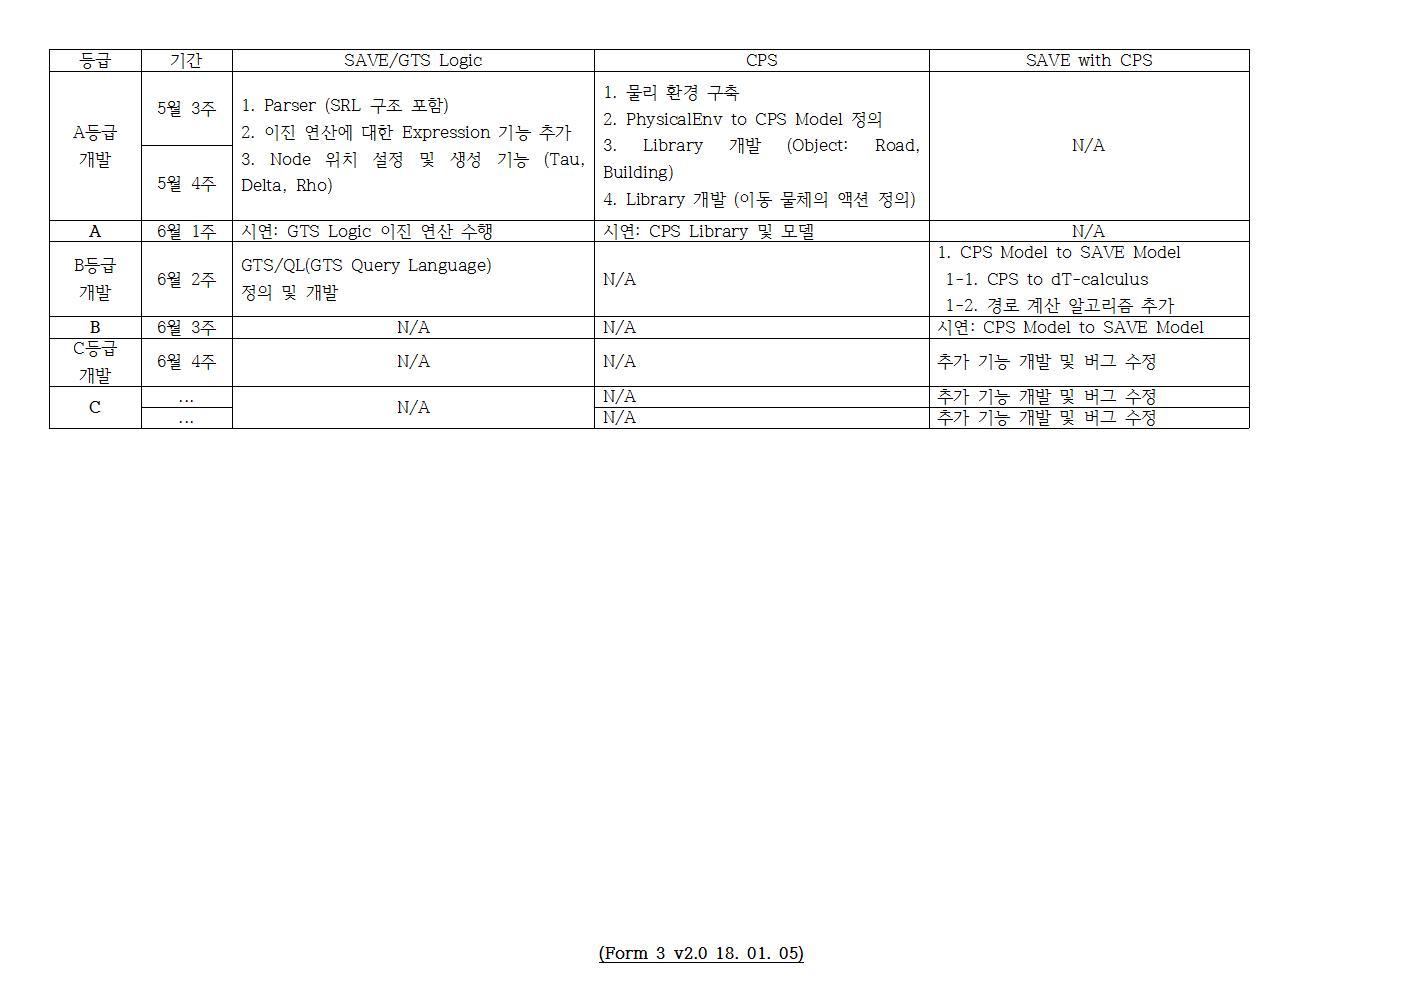 D-[18-001-RD-01]-[SAVE 3.0]-[2018-05-31][SH]003.jpg